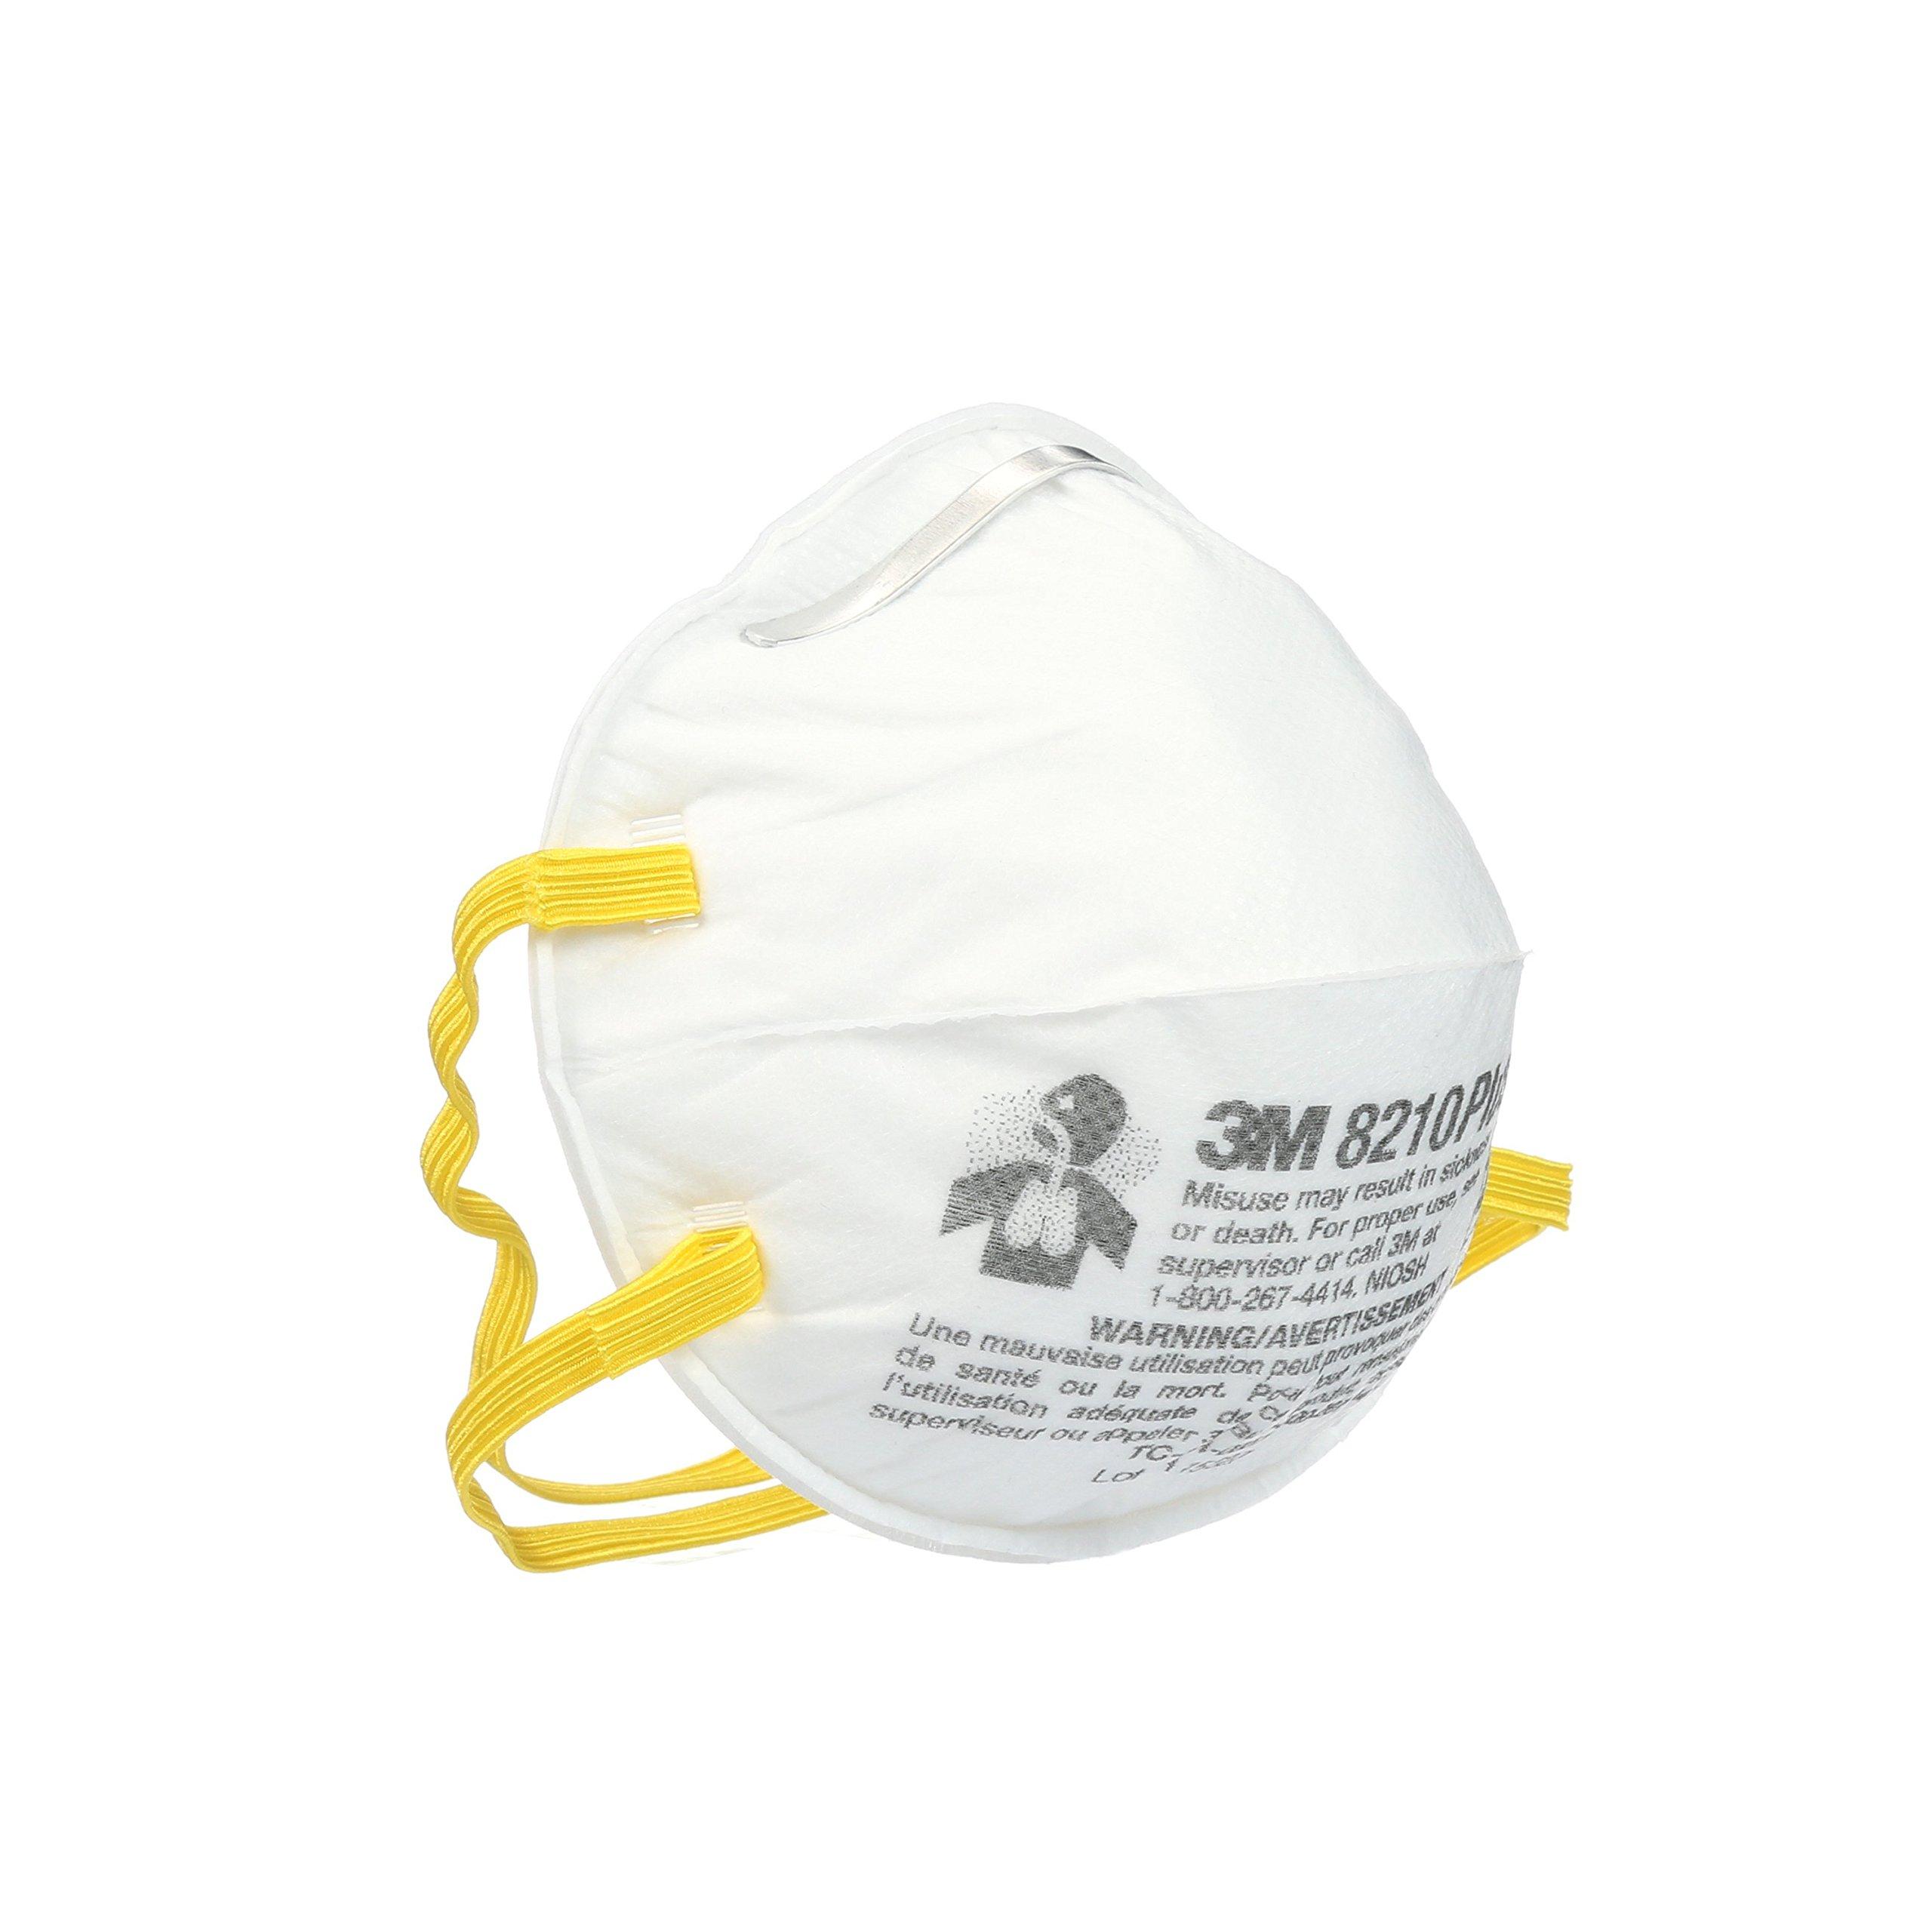 3M 8210 Plus Paint Sanding Dust Particulate Respirators, N95, 20-Pack by 3M (Image #3)